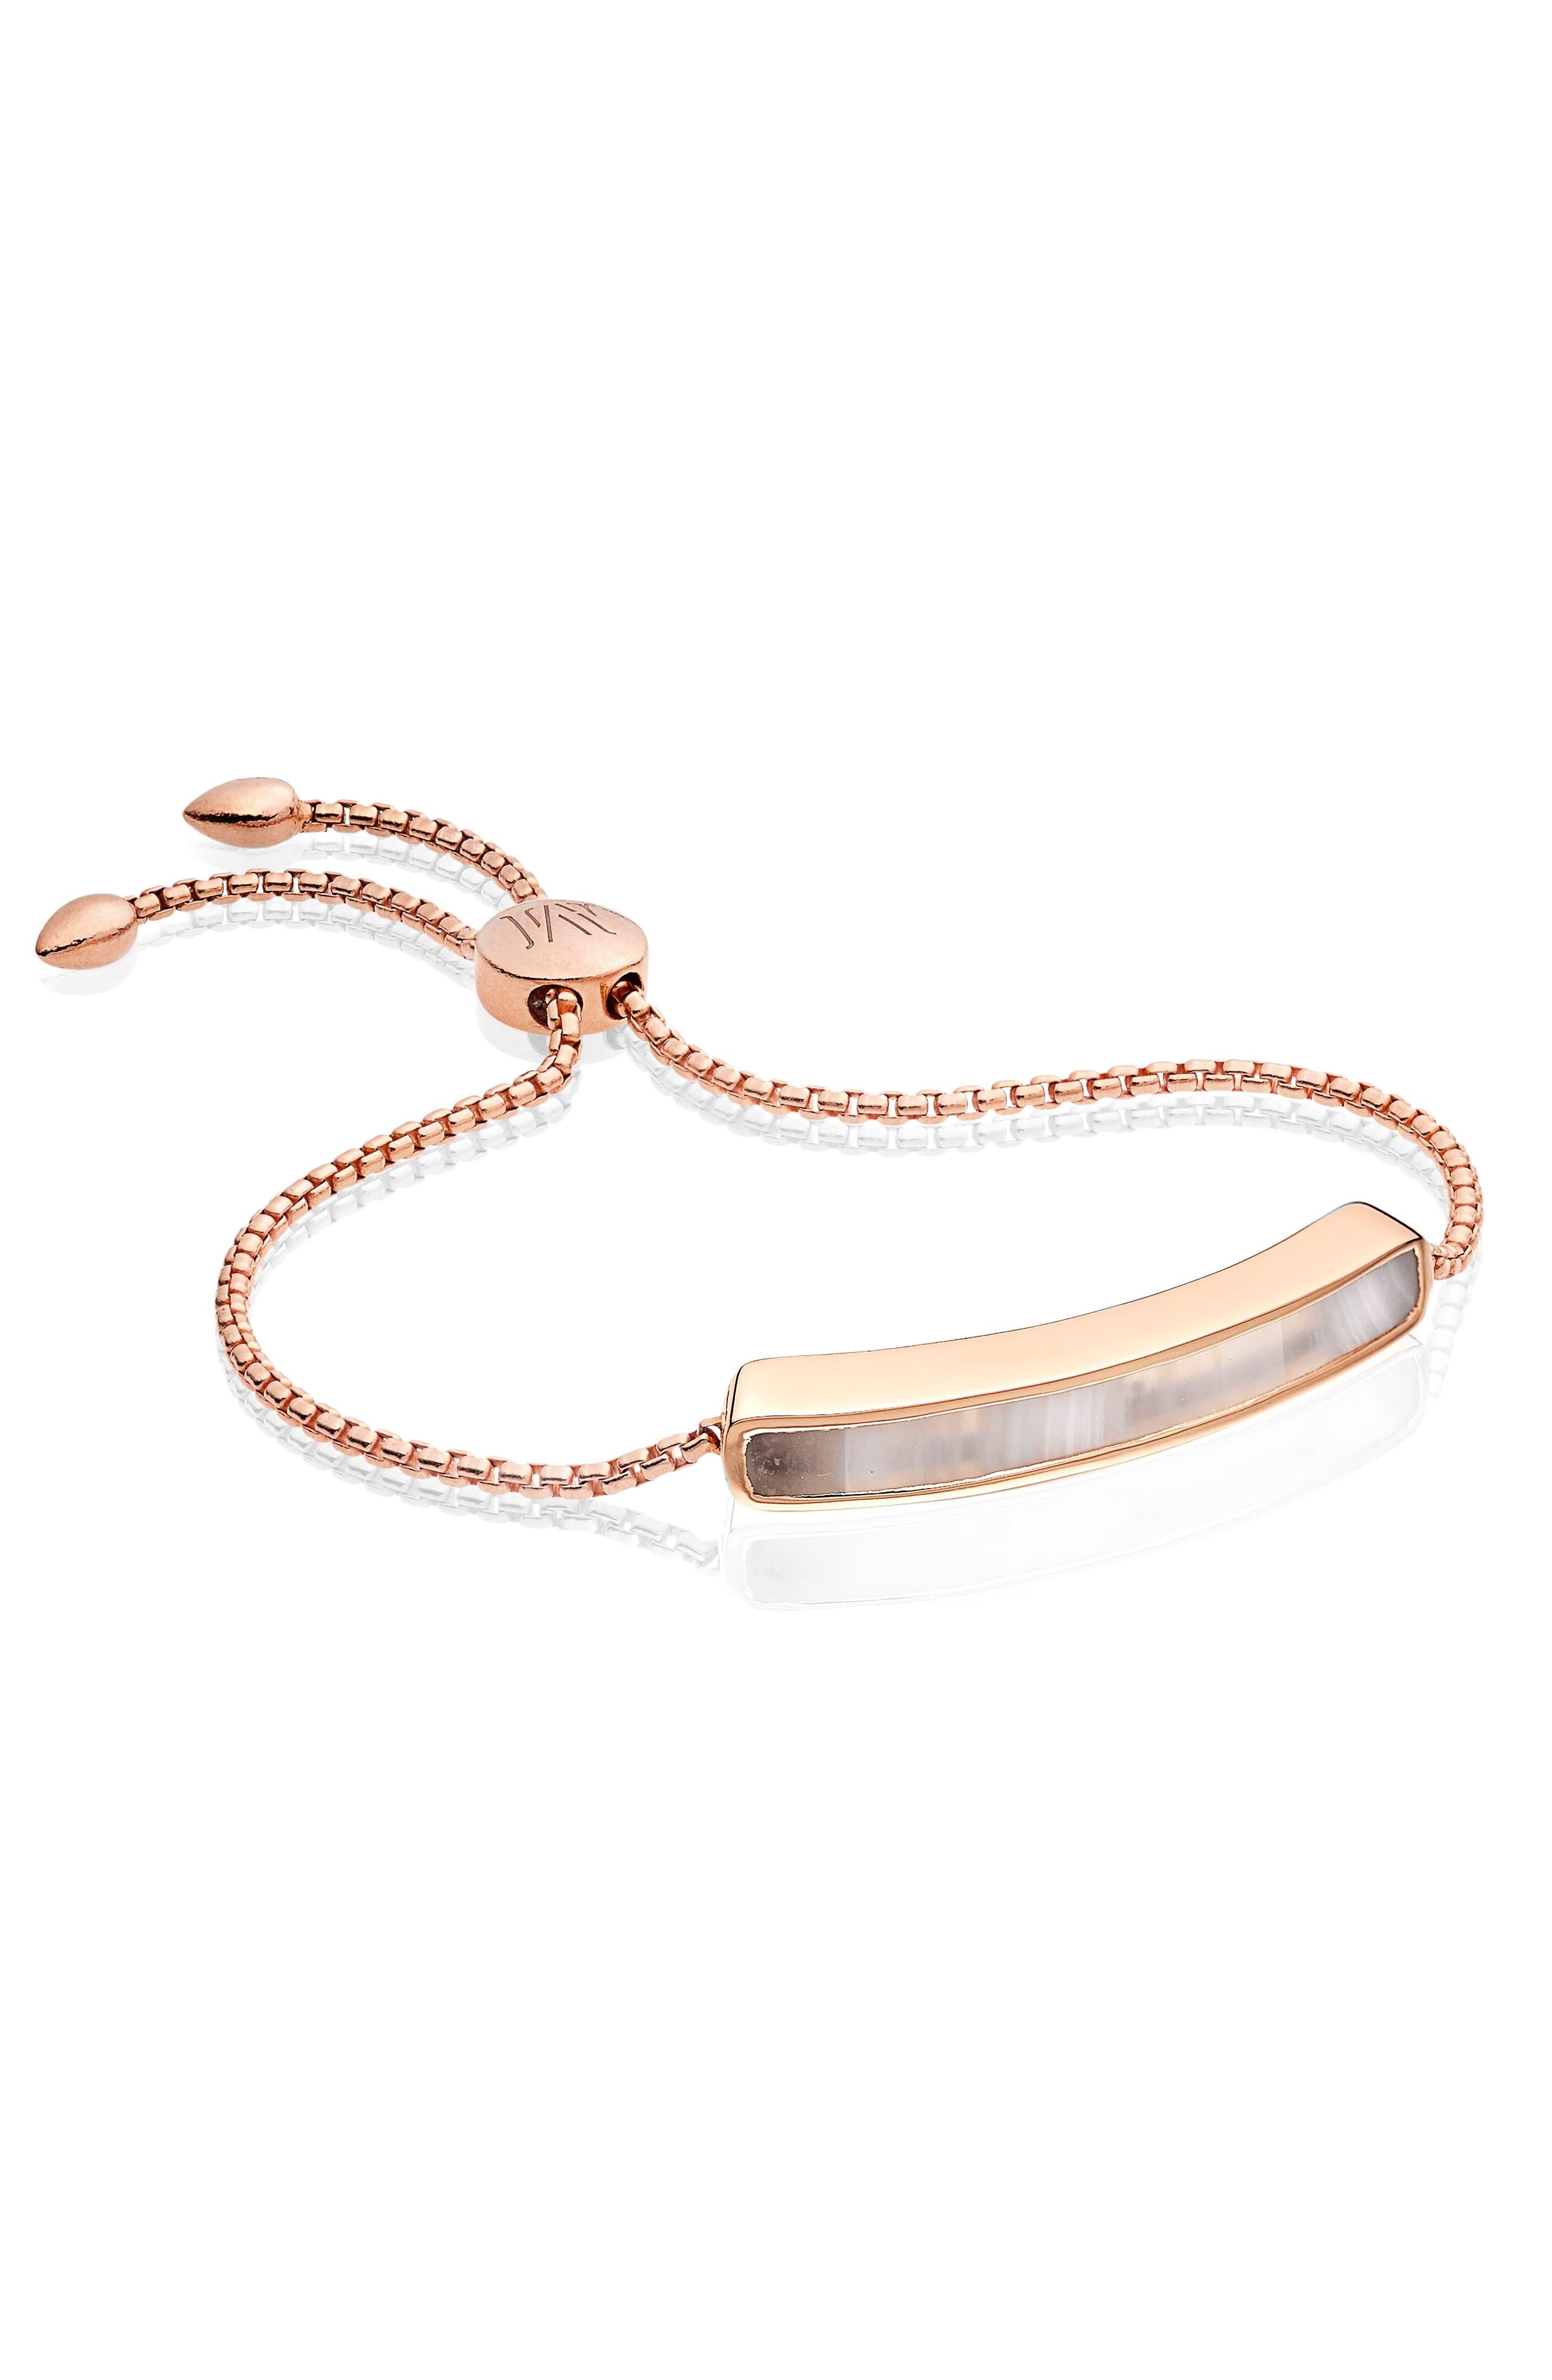 MONICA VINADER,                             Engravable Baja Stone Bracelet,                             Alternate thumbnail 4, color,                             ROSE GOLD/ GREY